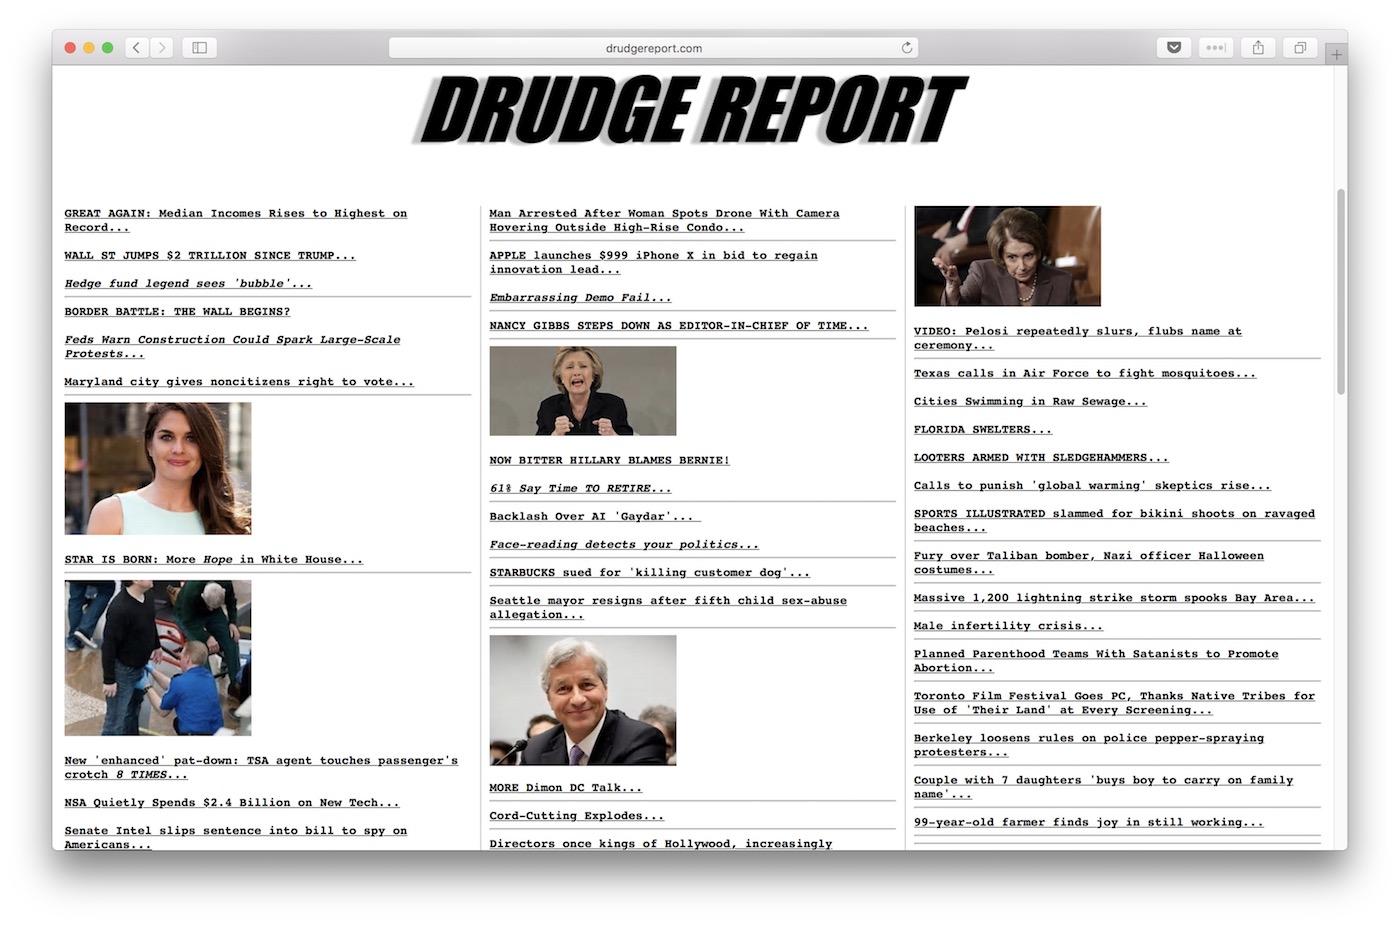 The Drudge Report